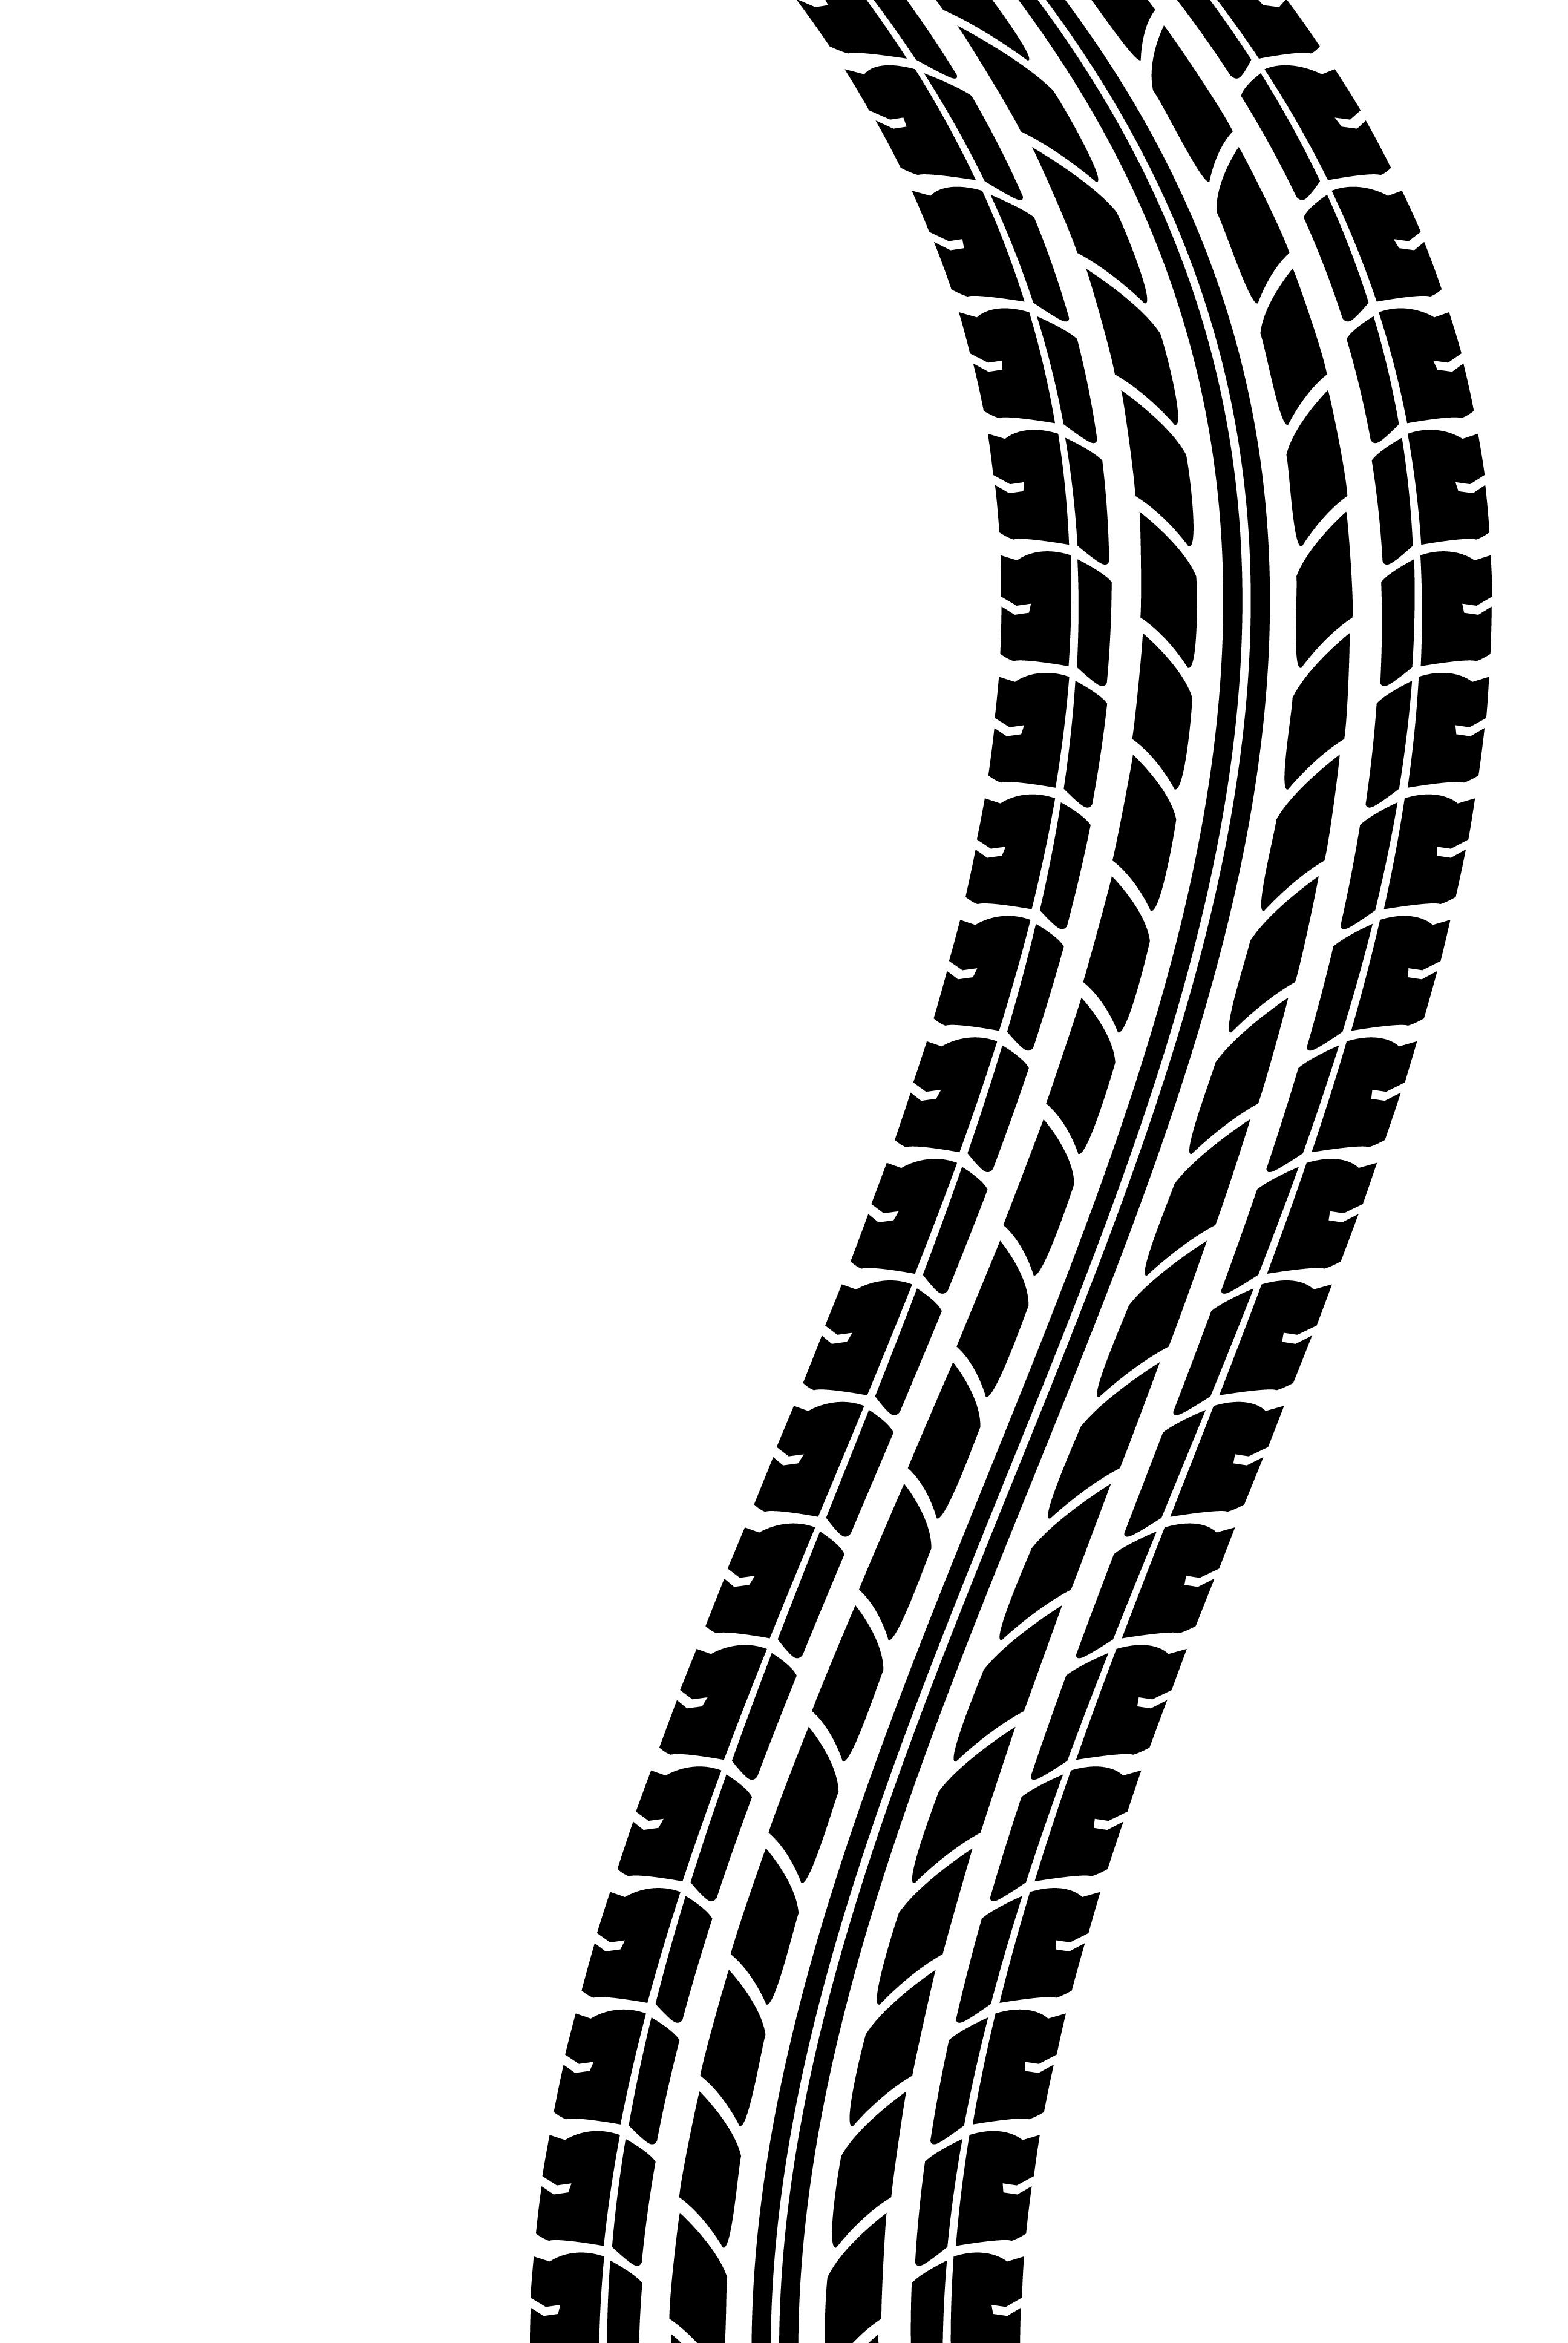 Clipart tire tracks.